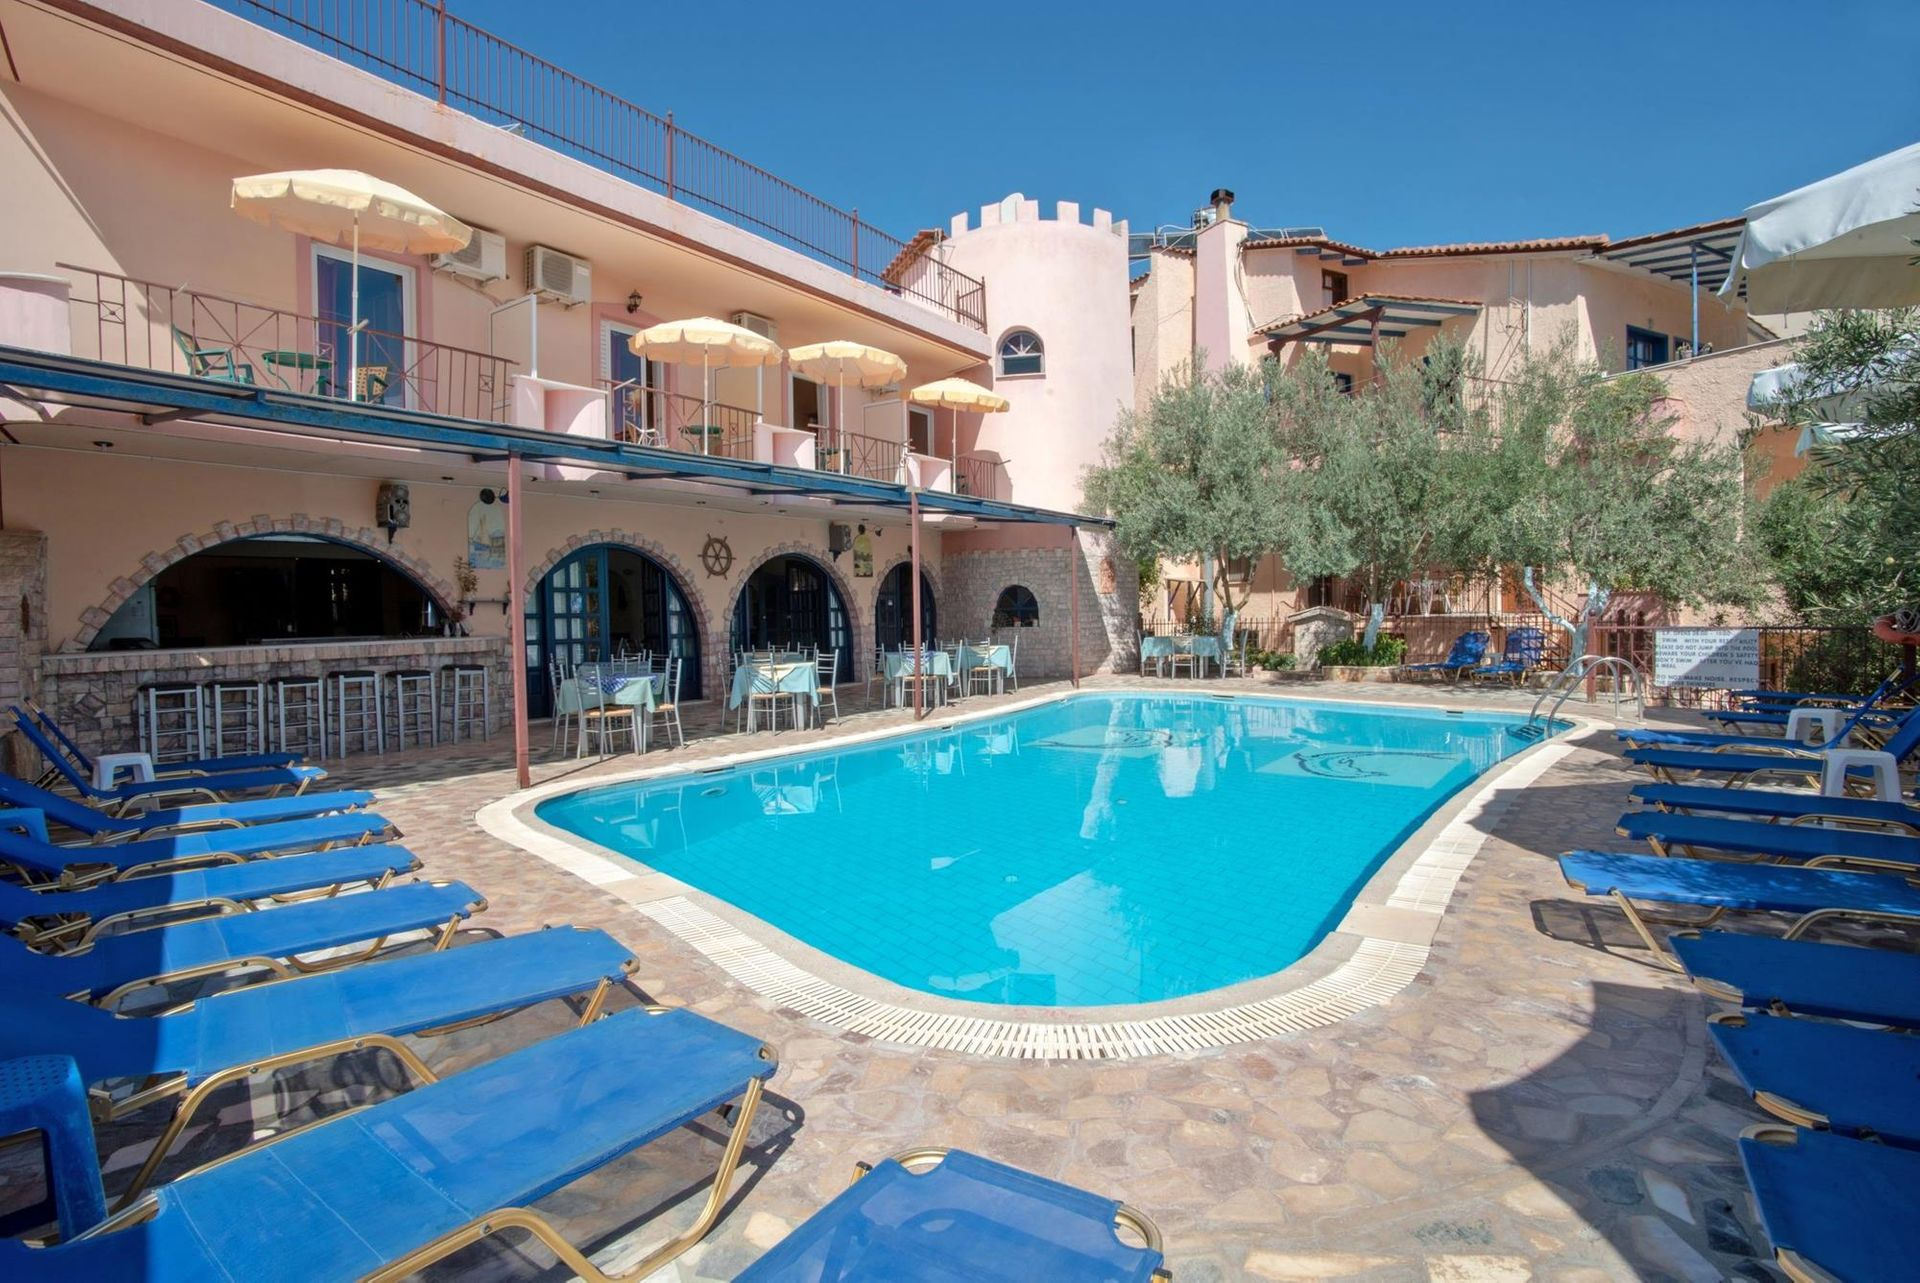 Kleoni Hotel & Apartments Tolo - Τολό ✦ 4 Ημέρες (3 Διανυκτερεύσεις) ✦ 2 άτομα ✦ Χωρίς Πρωινό ✦ 01/07/2021 έως 31/07/2021 ✦ Κοντά σε Παραλία!